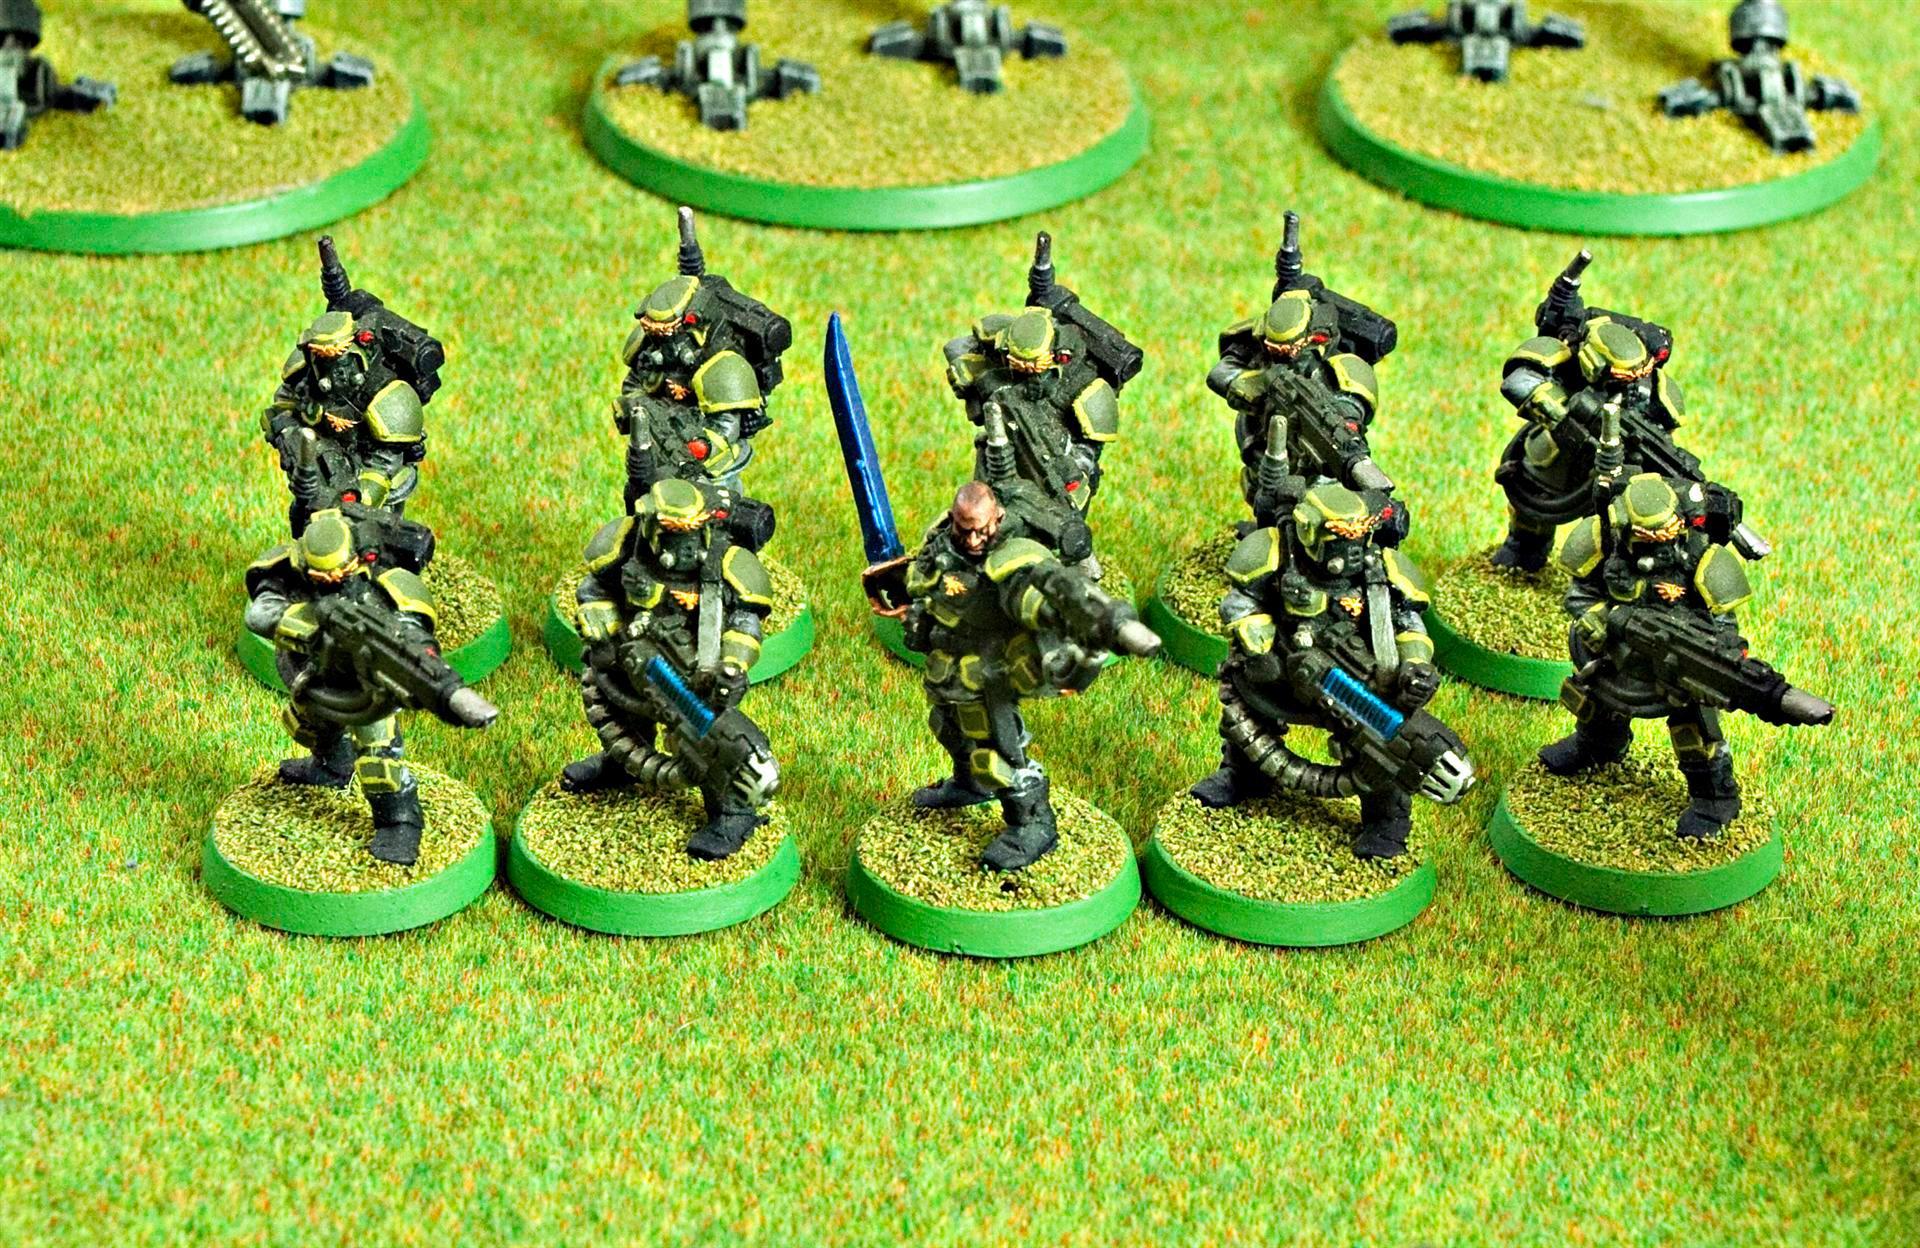 Astra Militarum, Guard, Imperial, Imperial Guard, Plasma Gun, Storm Troopers, Warhammer 40,000